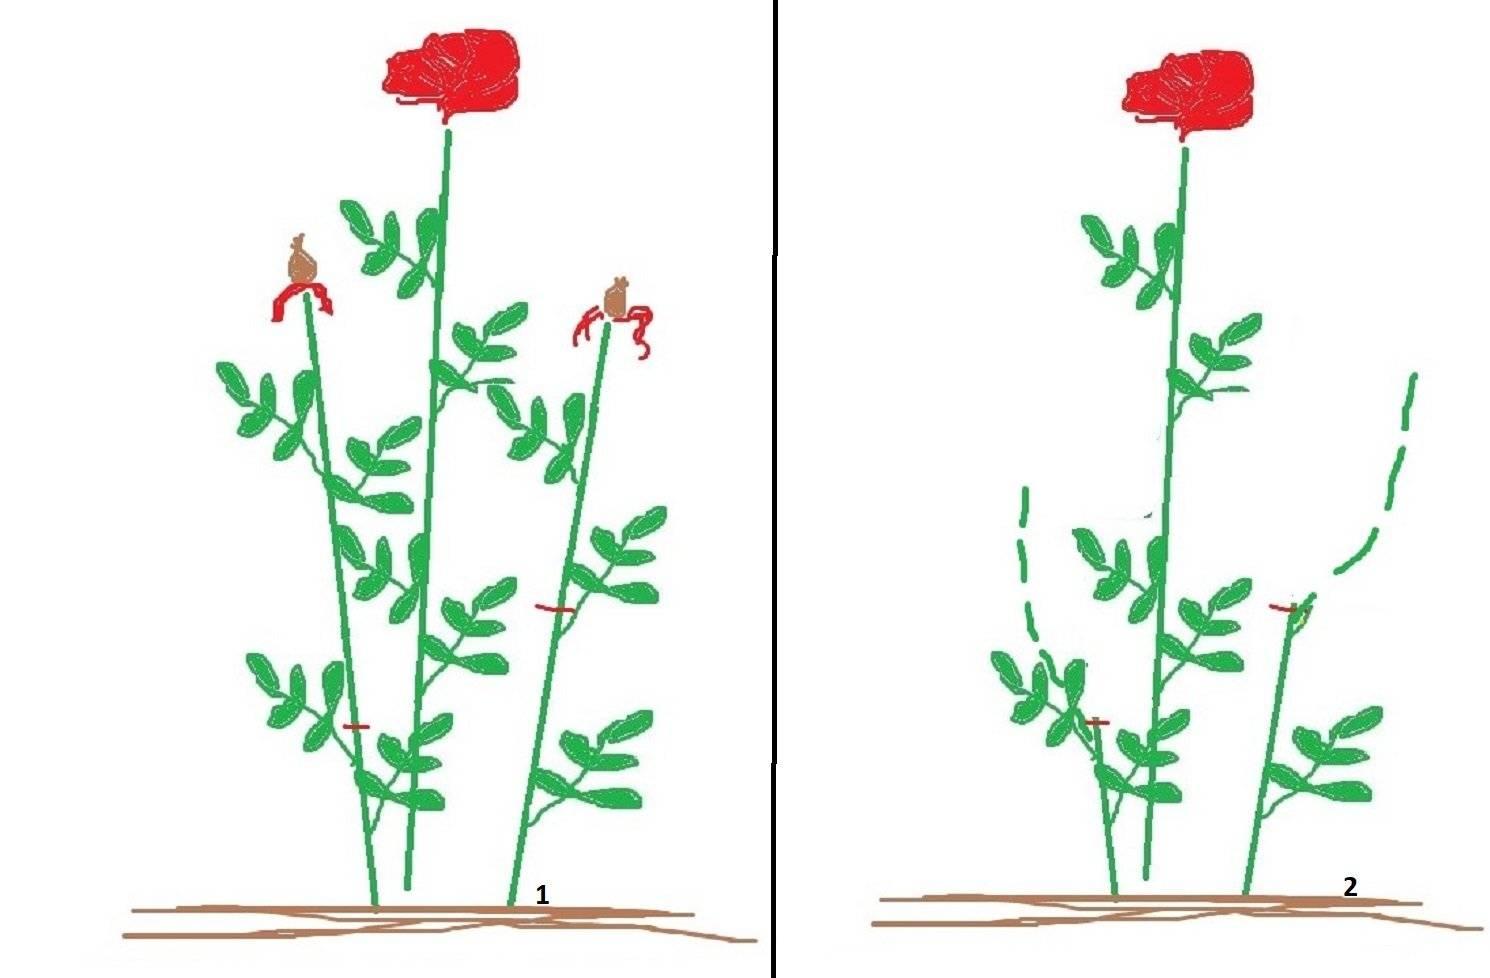 Обрезка роз после цветения летом: видео, фото, описание работ